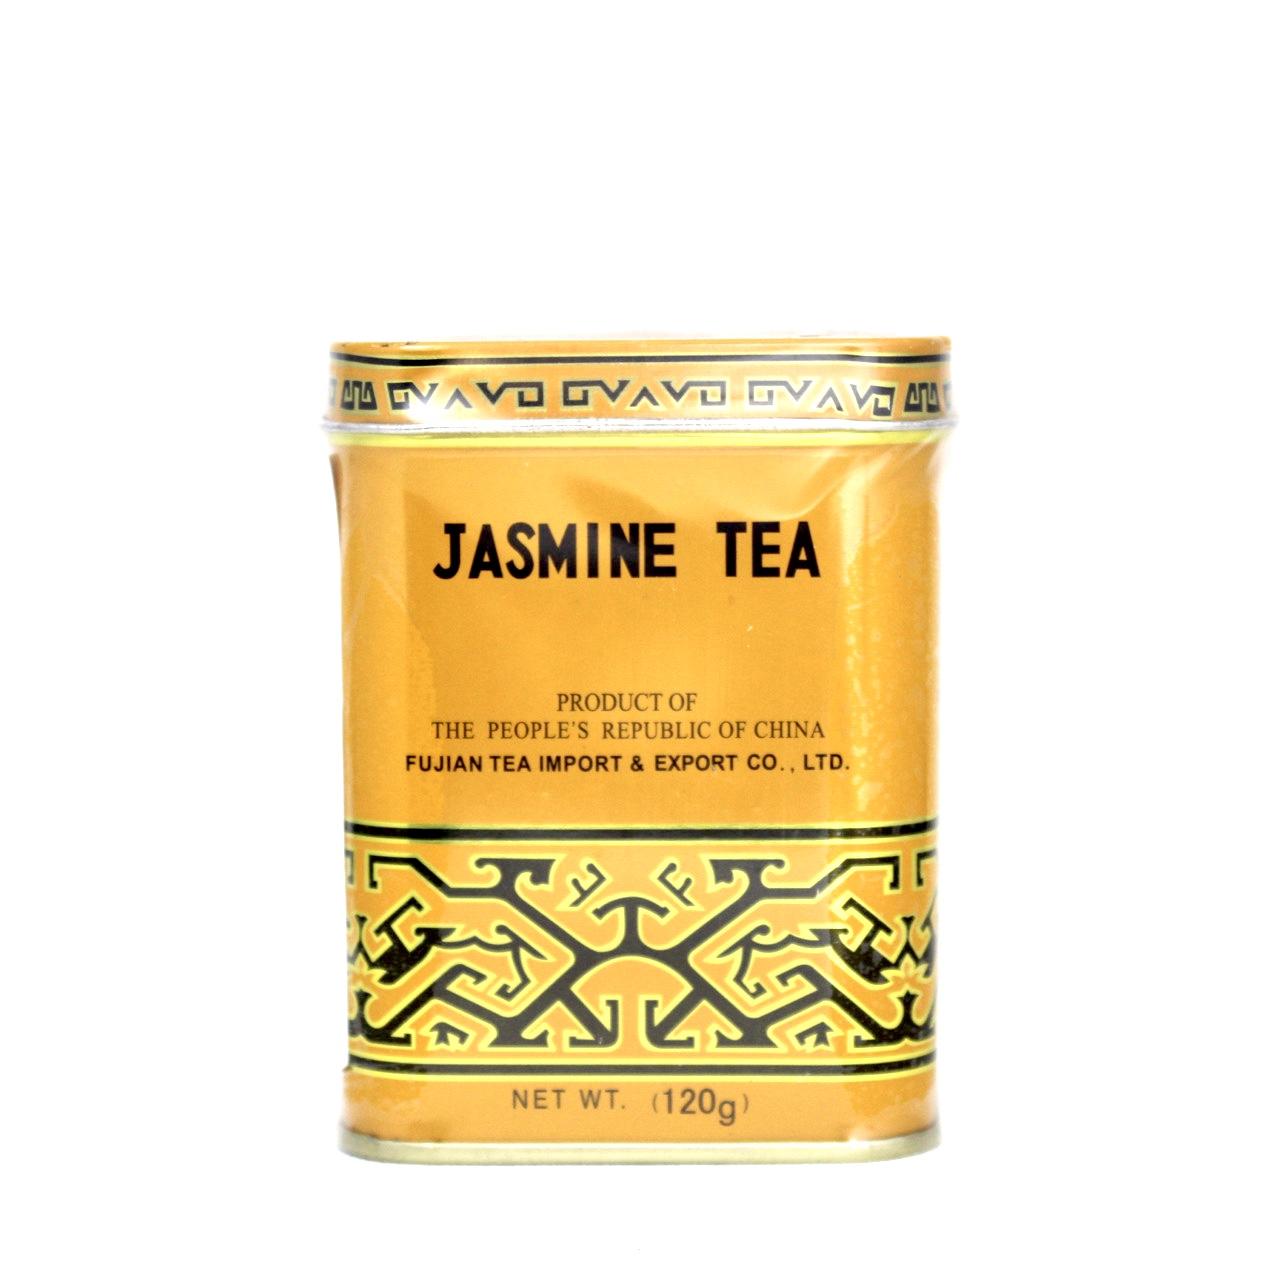 FUJIAN JASMINE TEA 120g LATA 1030 (VENCIMENTO 31/10/2021)